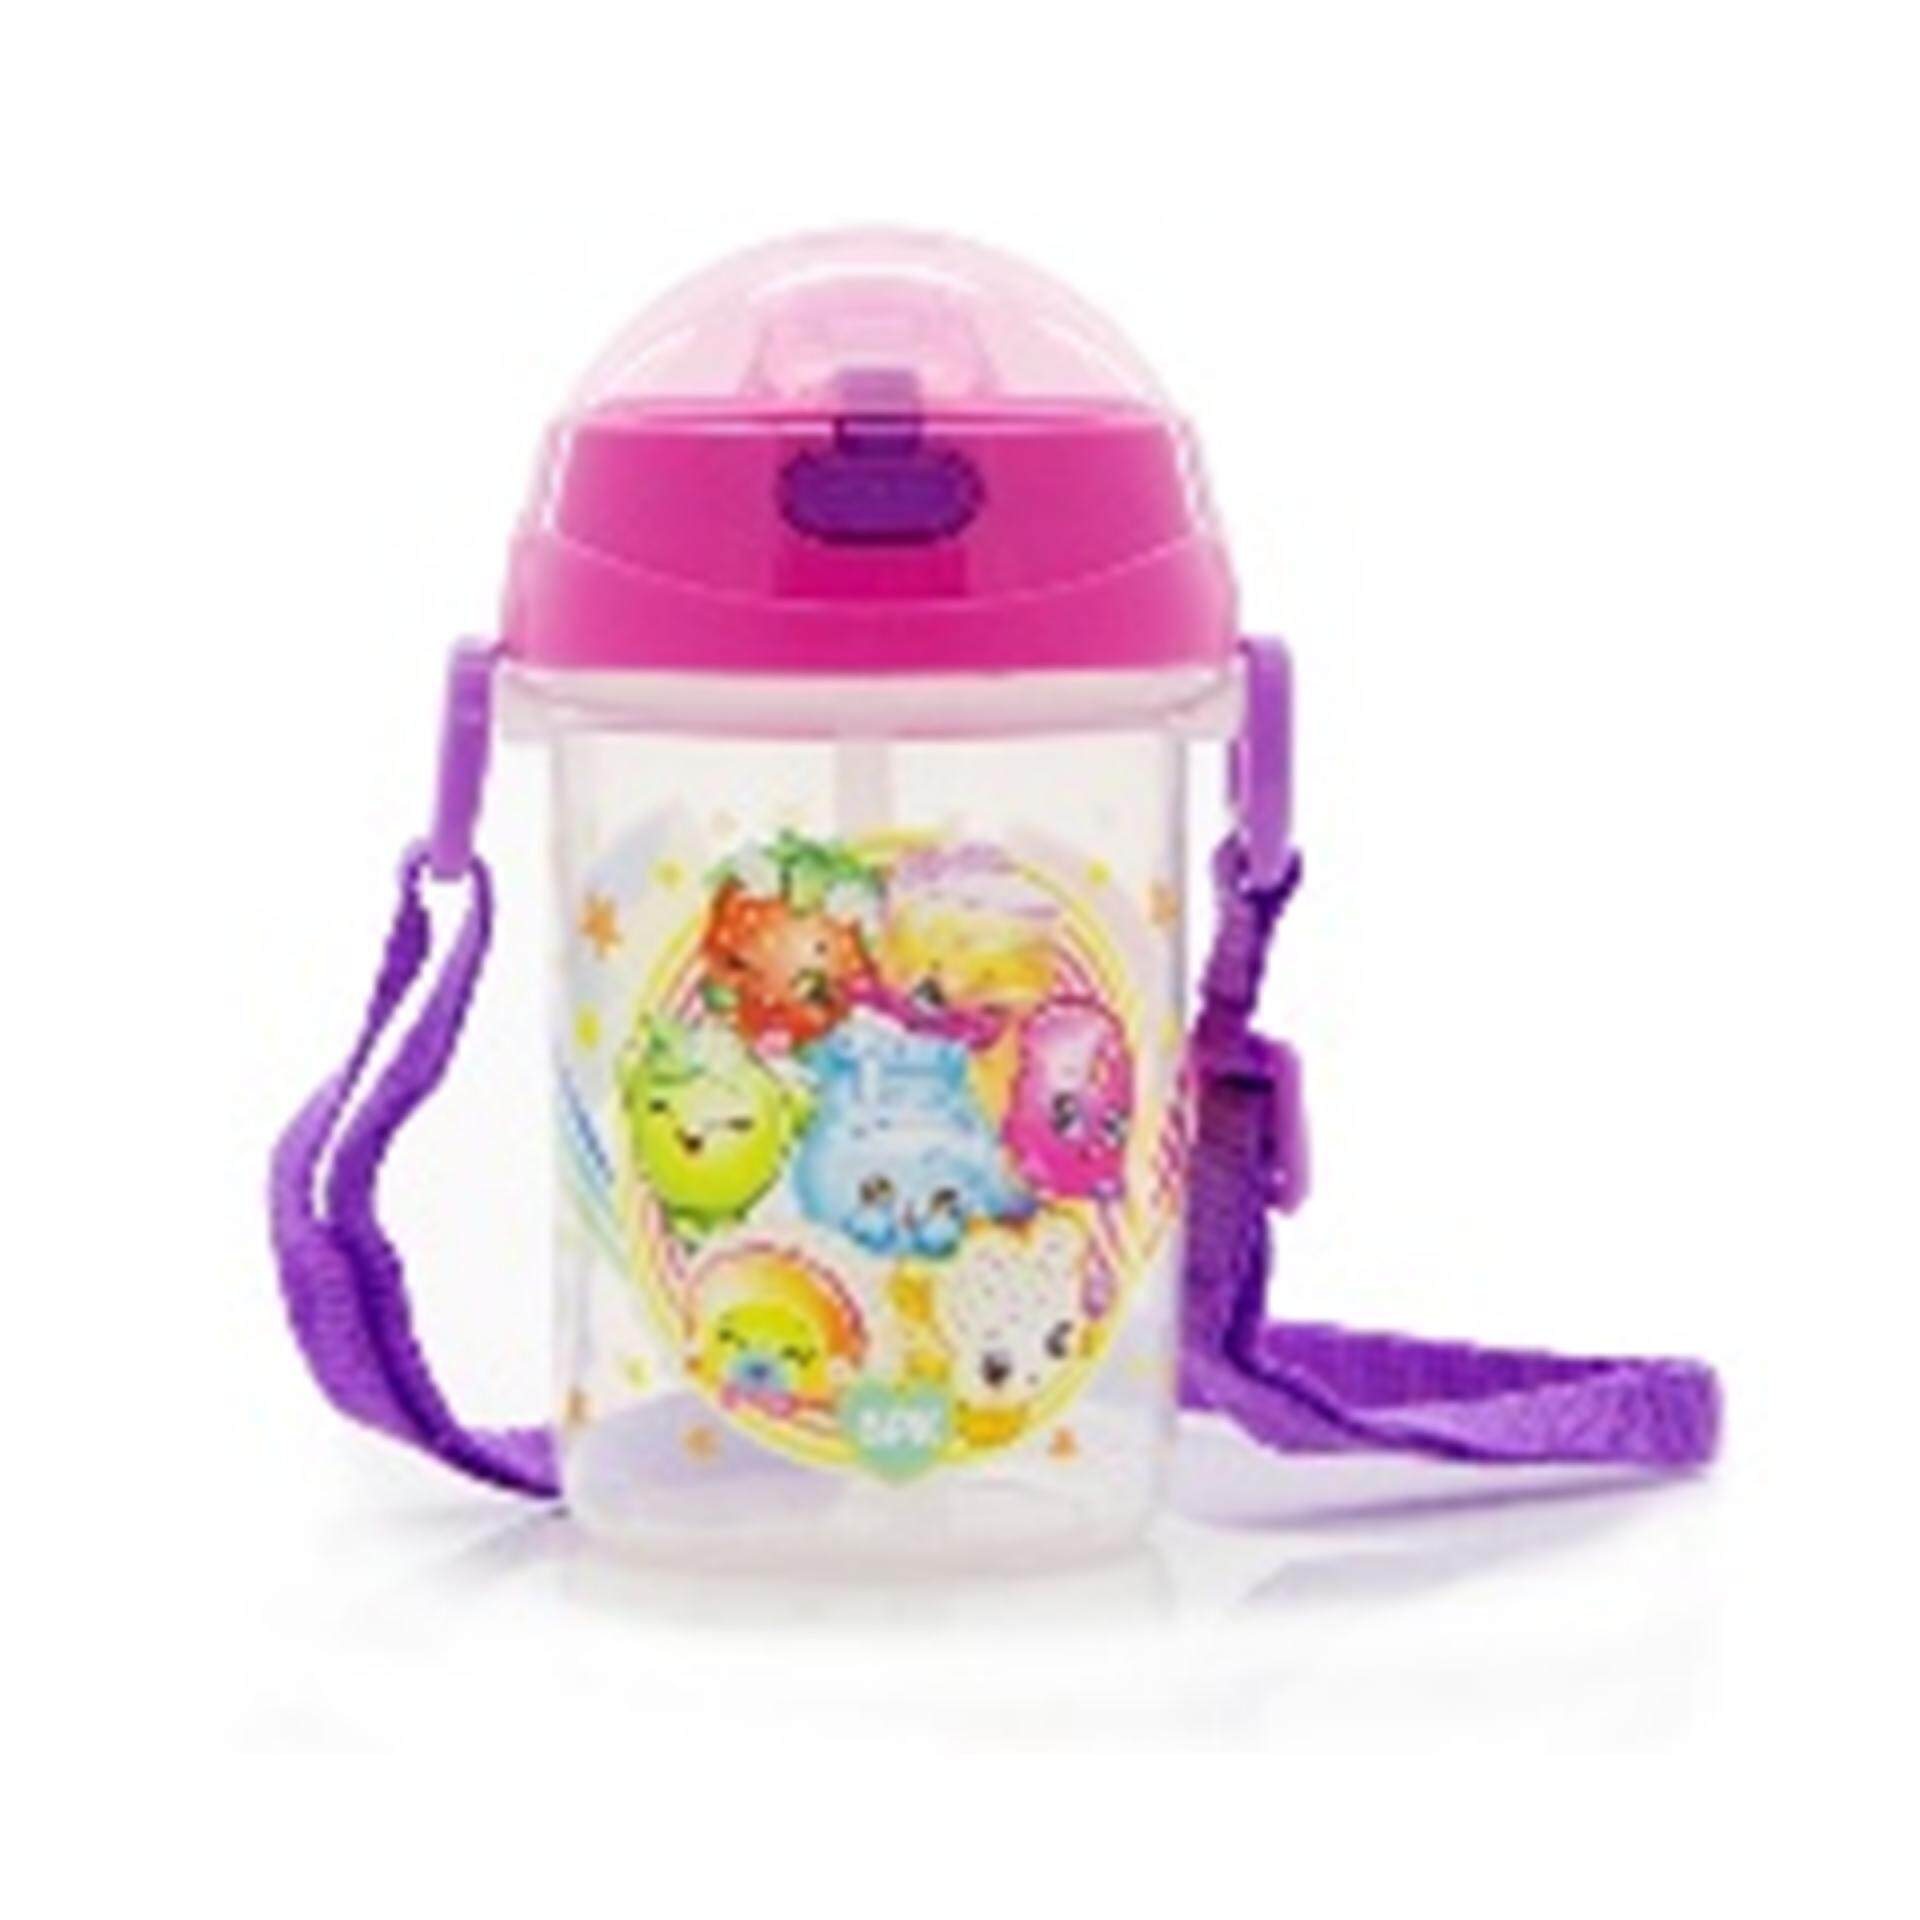 Neoflam I Water Bottle Biru Pink 380ml Daftar Harga Terkini Dan Lock Abf641 Hbb Shopkins Colour